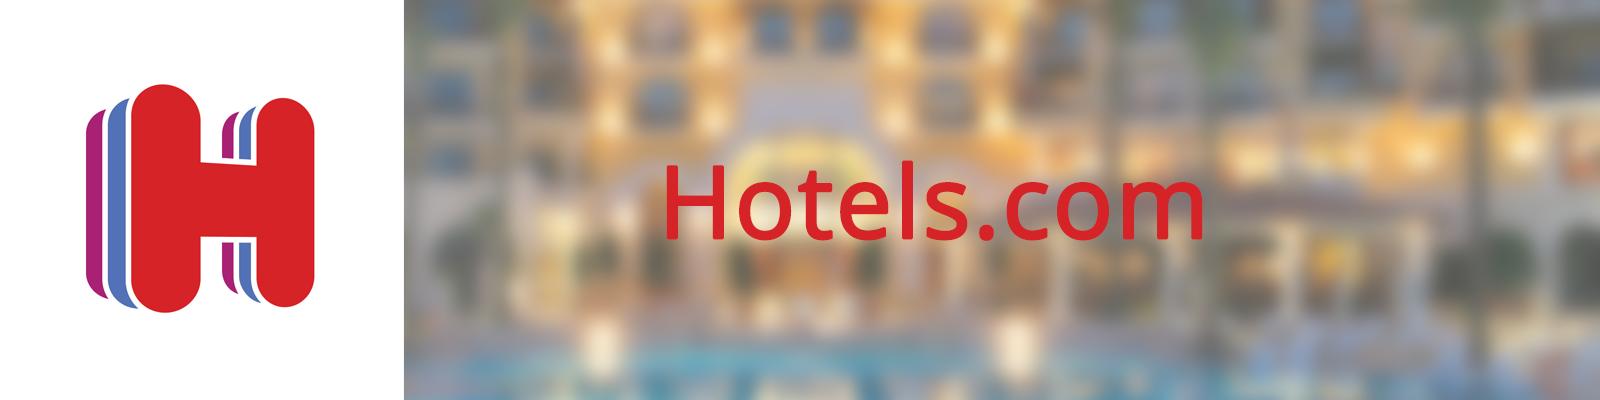 app like hotels.com